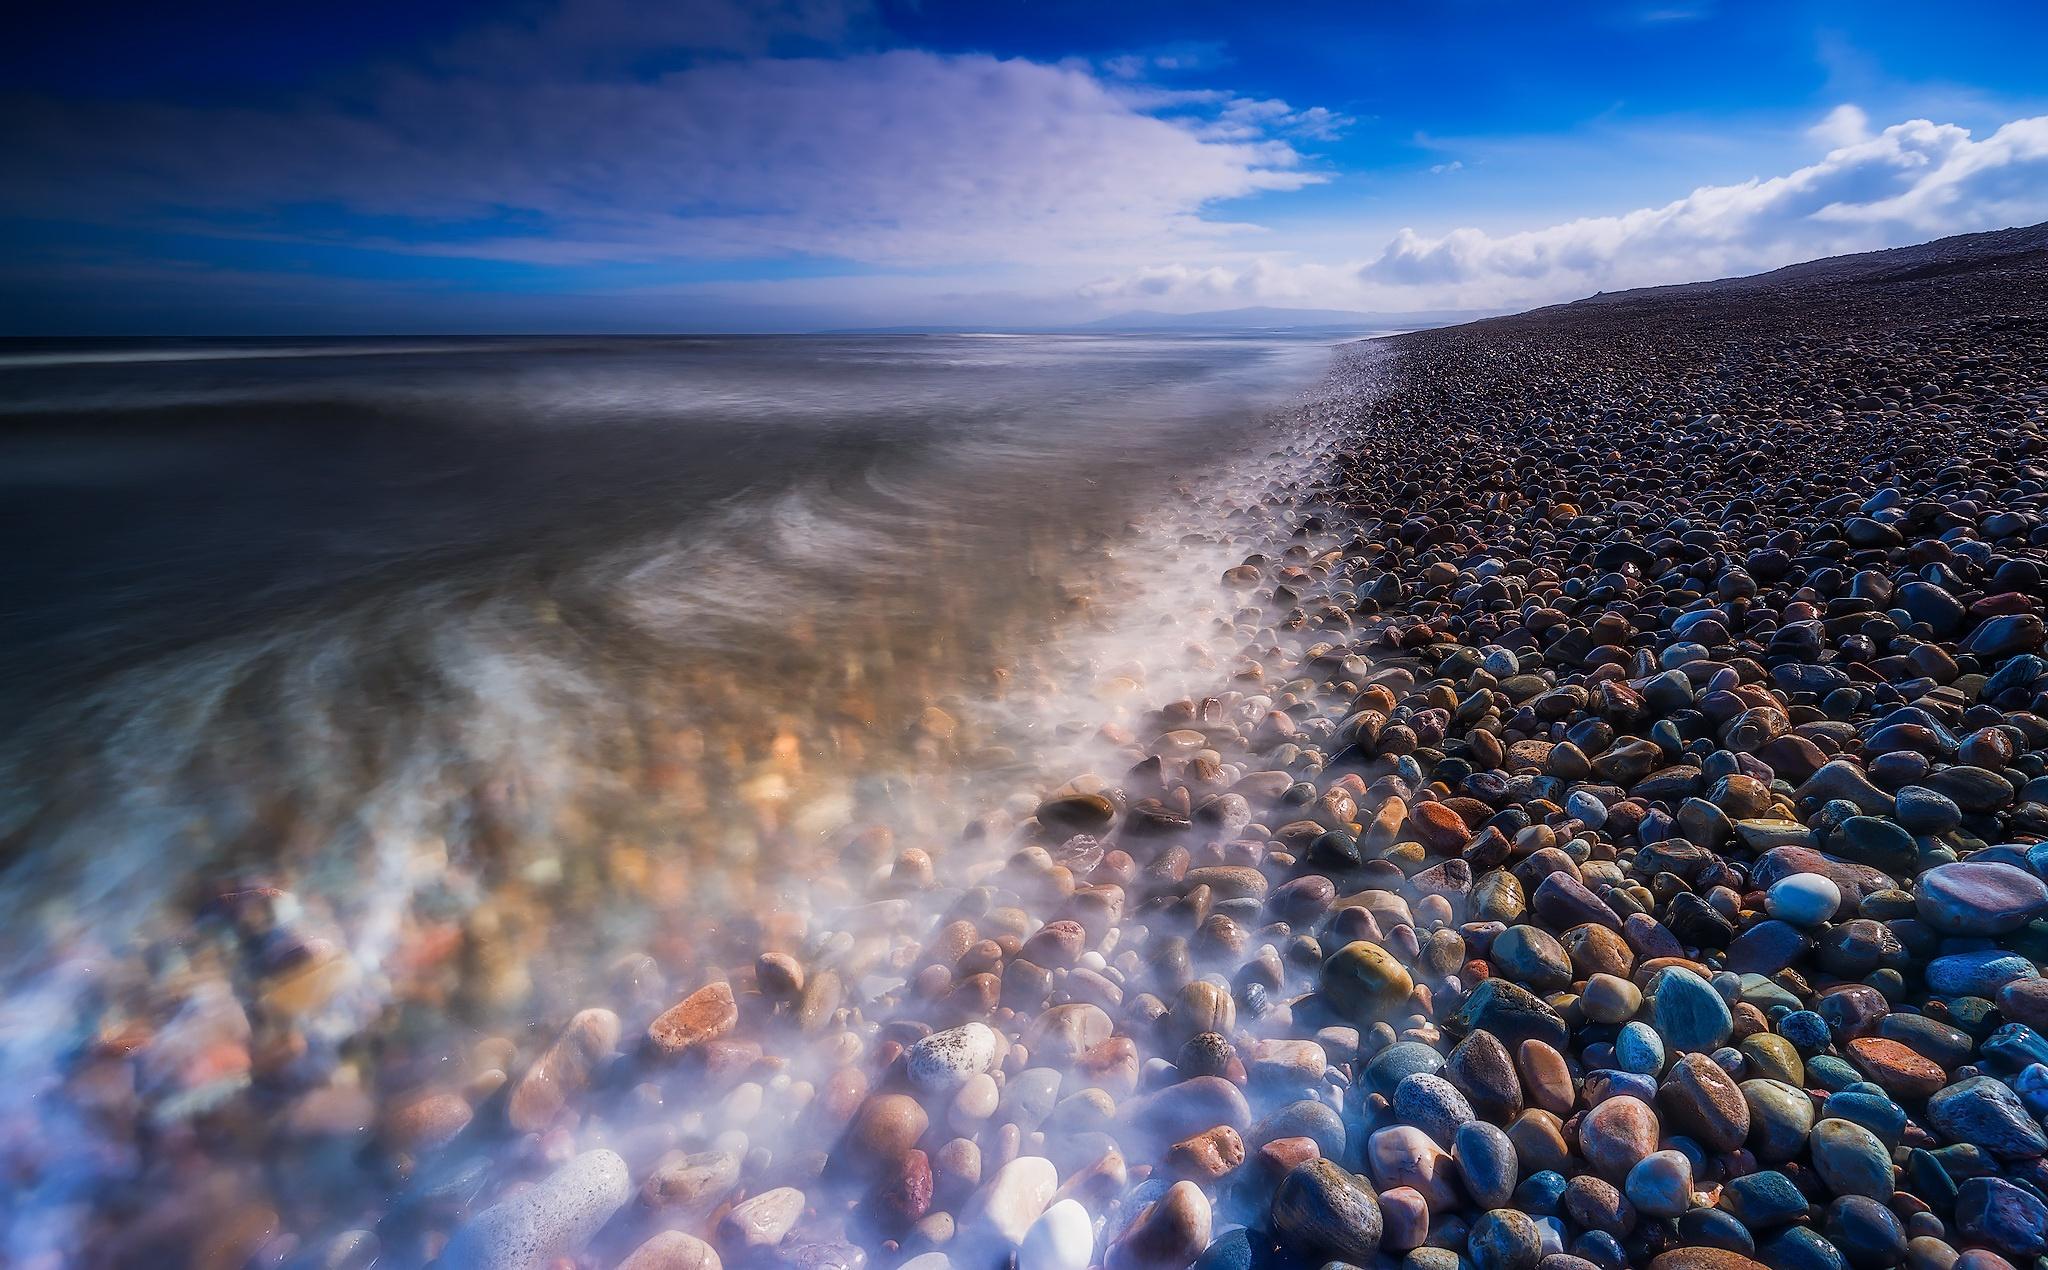 Scotland Nature Outdoors Stones Sea Water Coast Long Exposure Clouds 2048x1270